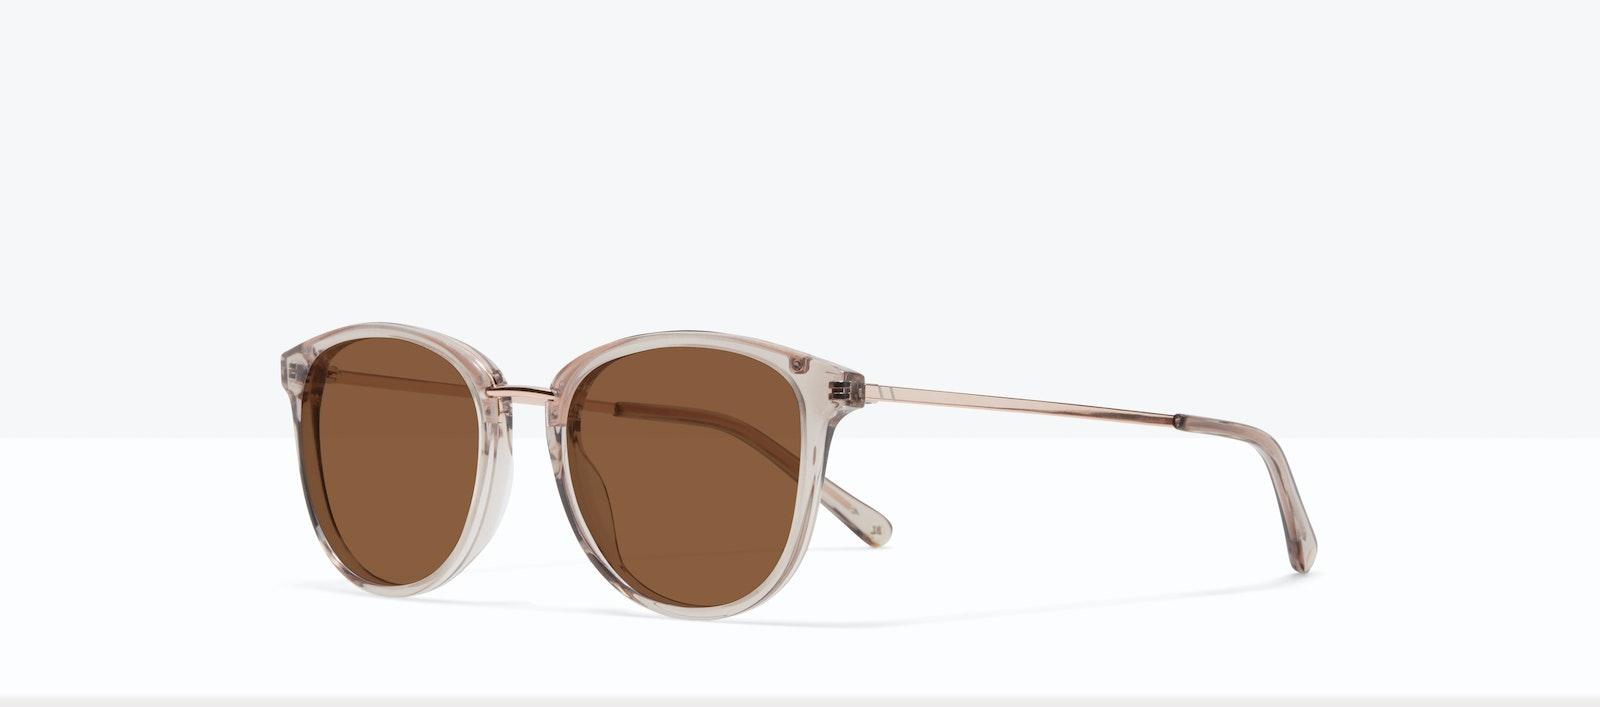 Affordable Fashion Glasses Square Round Sunglasses Women Bella M Sand Tilt